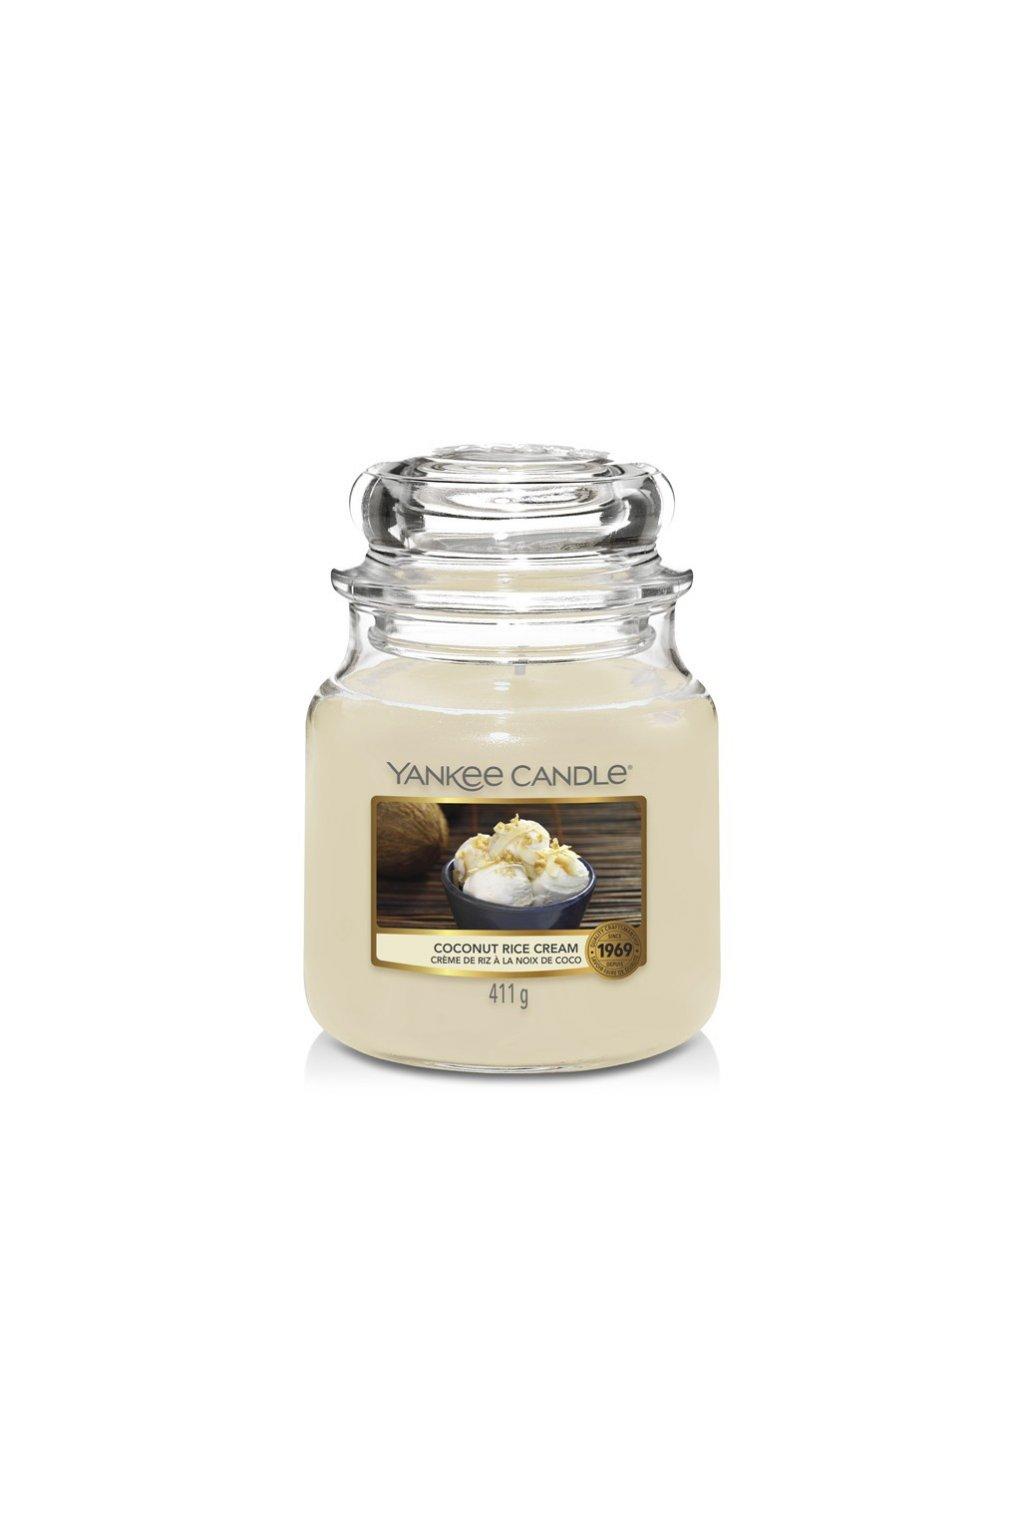 Yankee Candle Coconut Rice Cream 411g